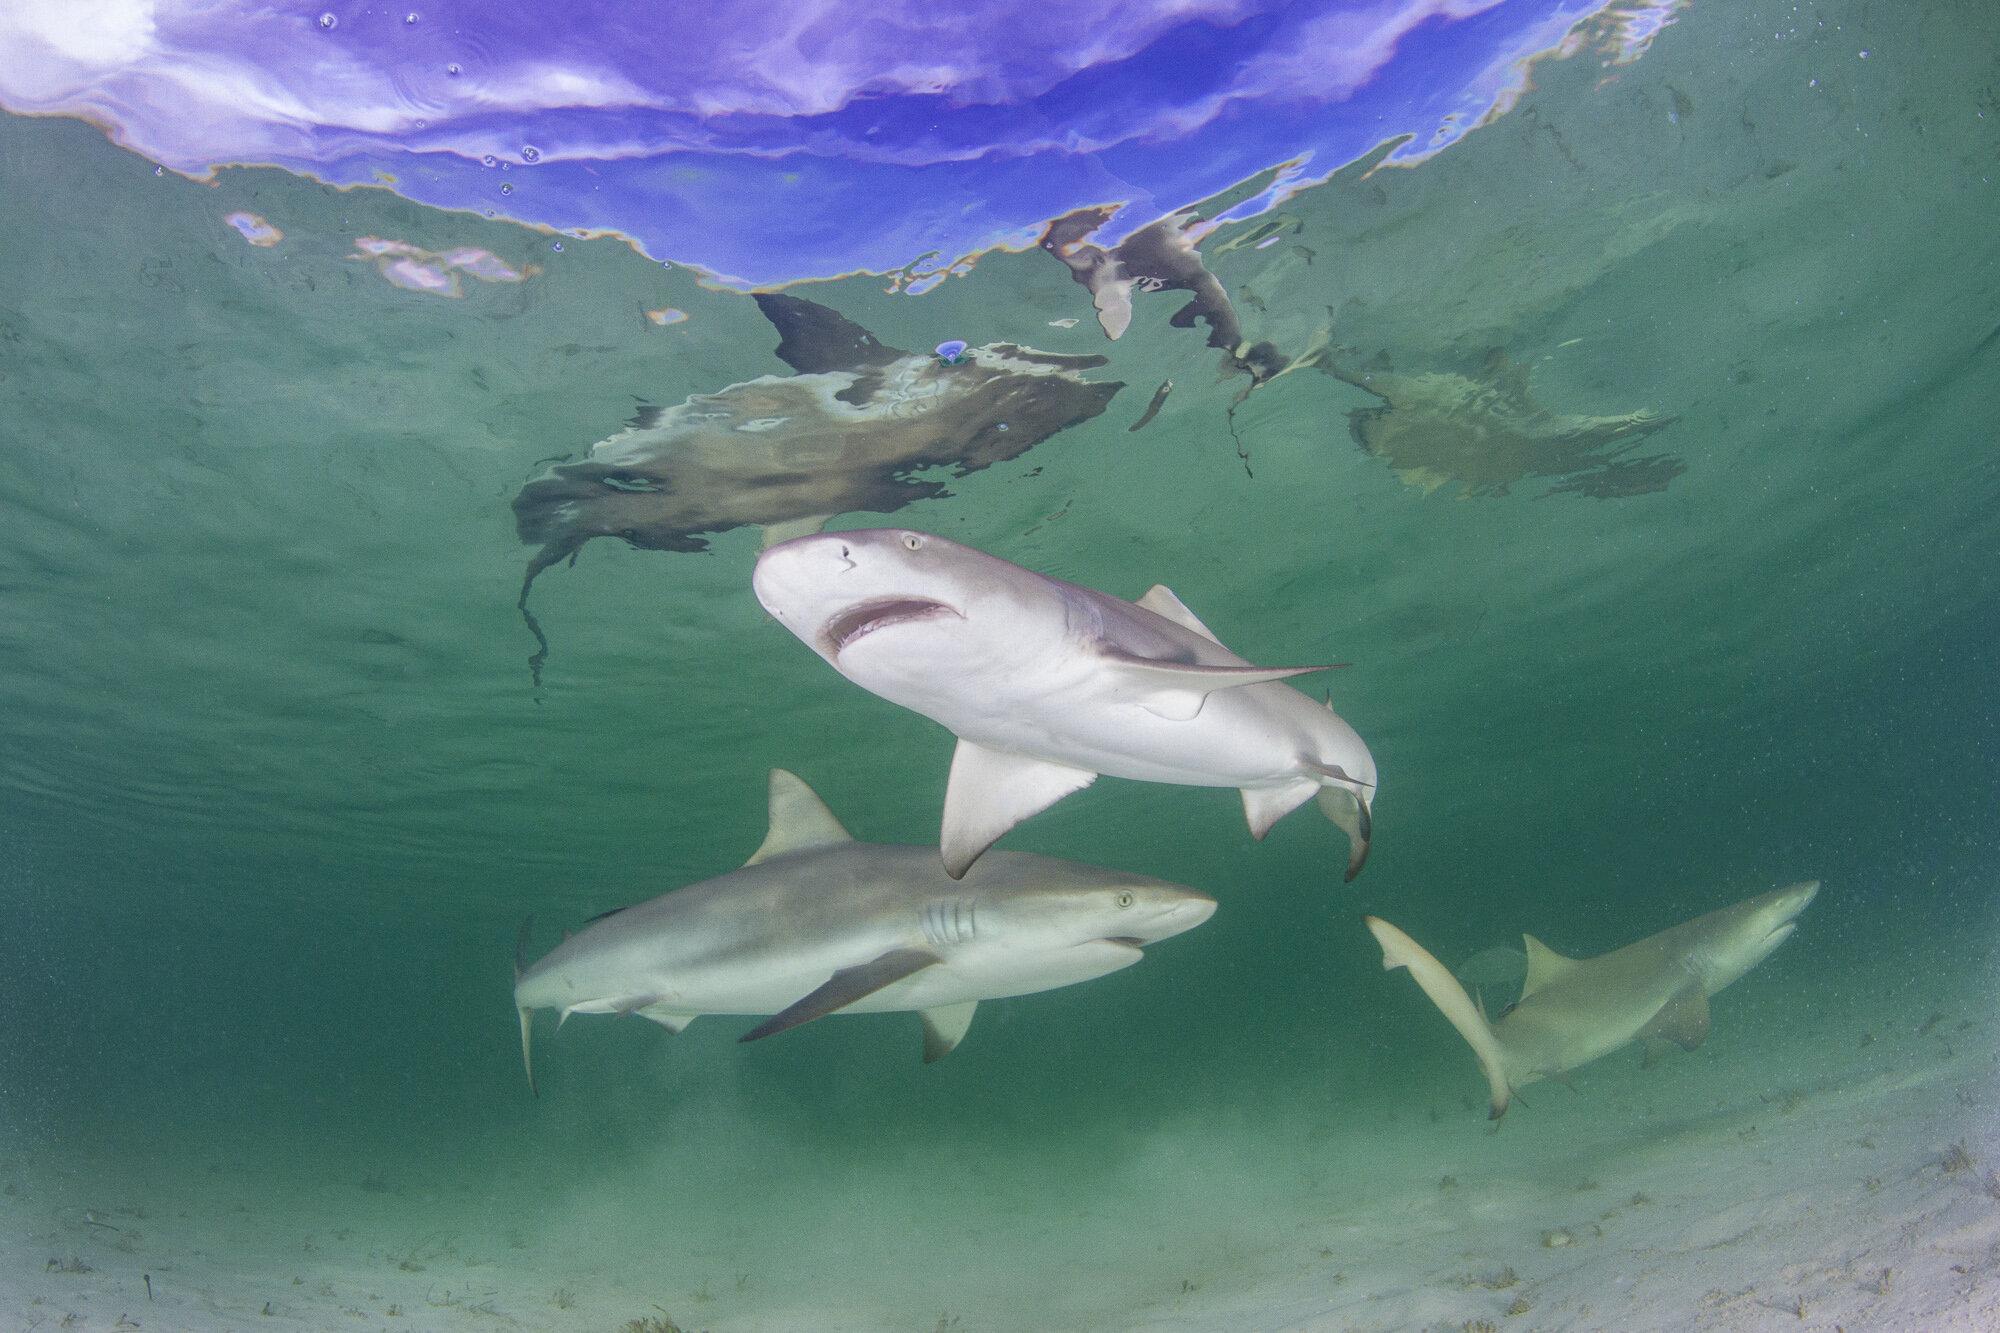 Lemon sharks made consistent, close passes